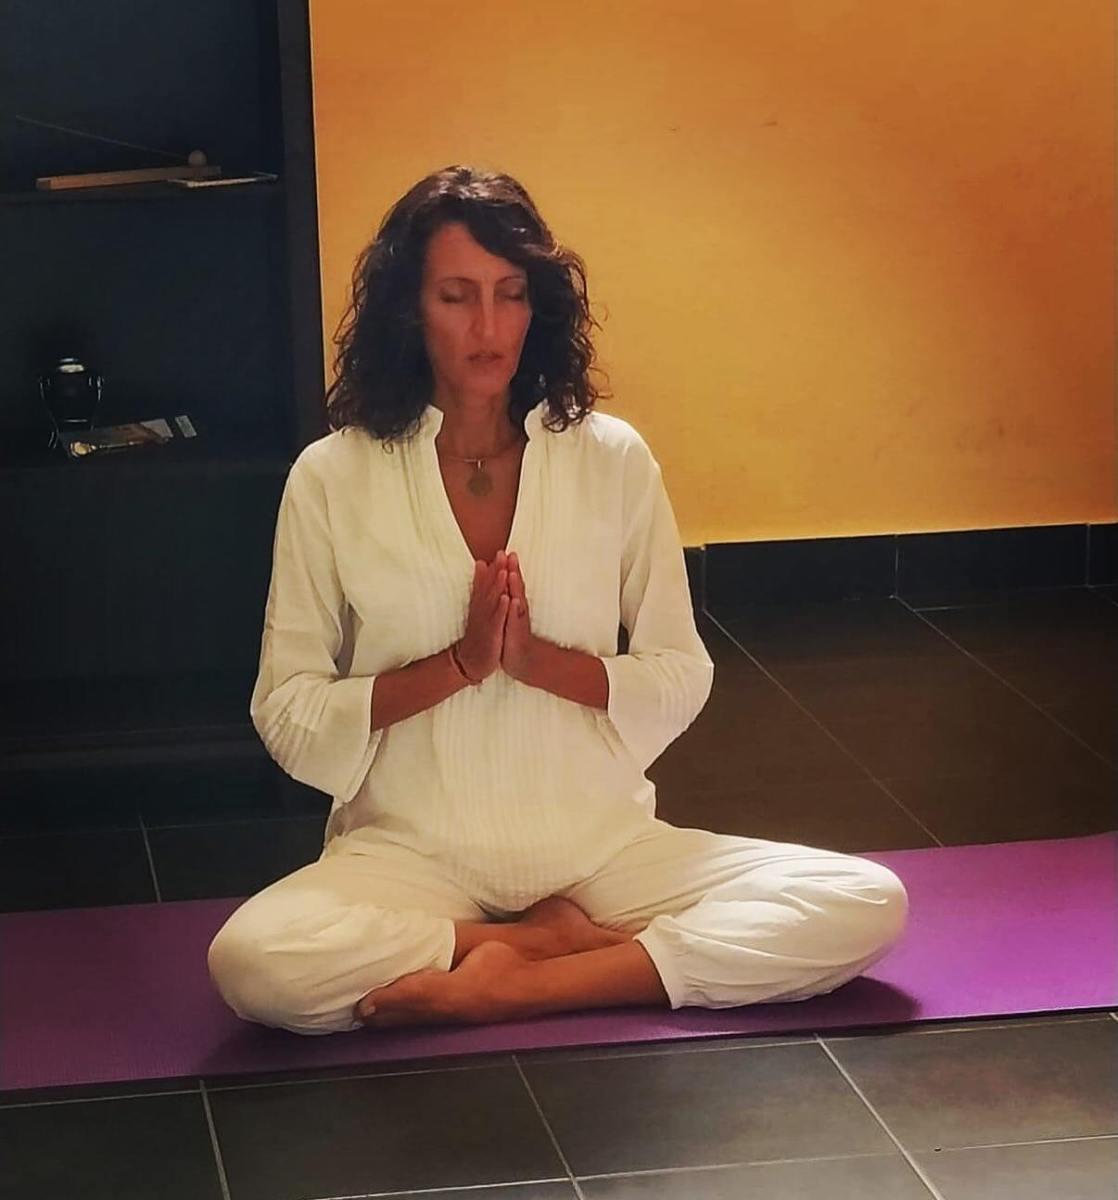 TAKUMI lifestyle - Yoga - Elena Cerasuolo 5